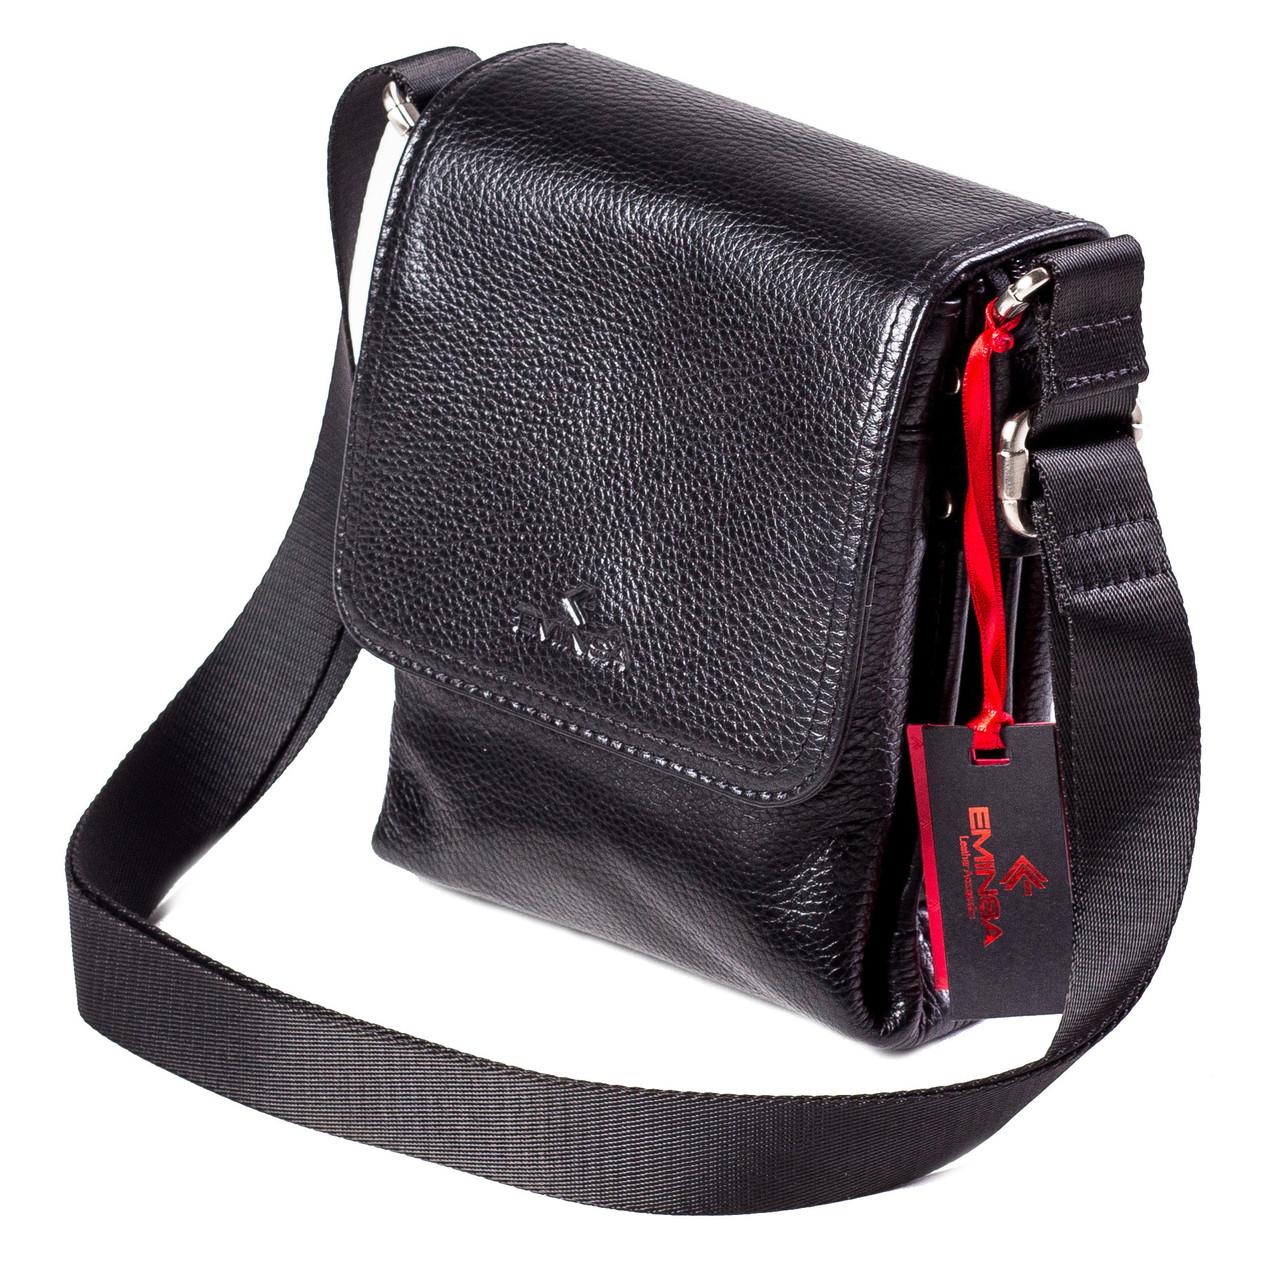 Мужская сумка кожаная черная Eminsa 6097-37-1